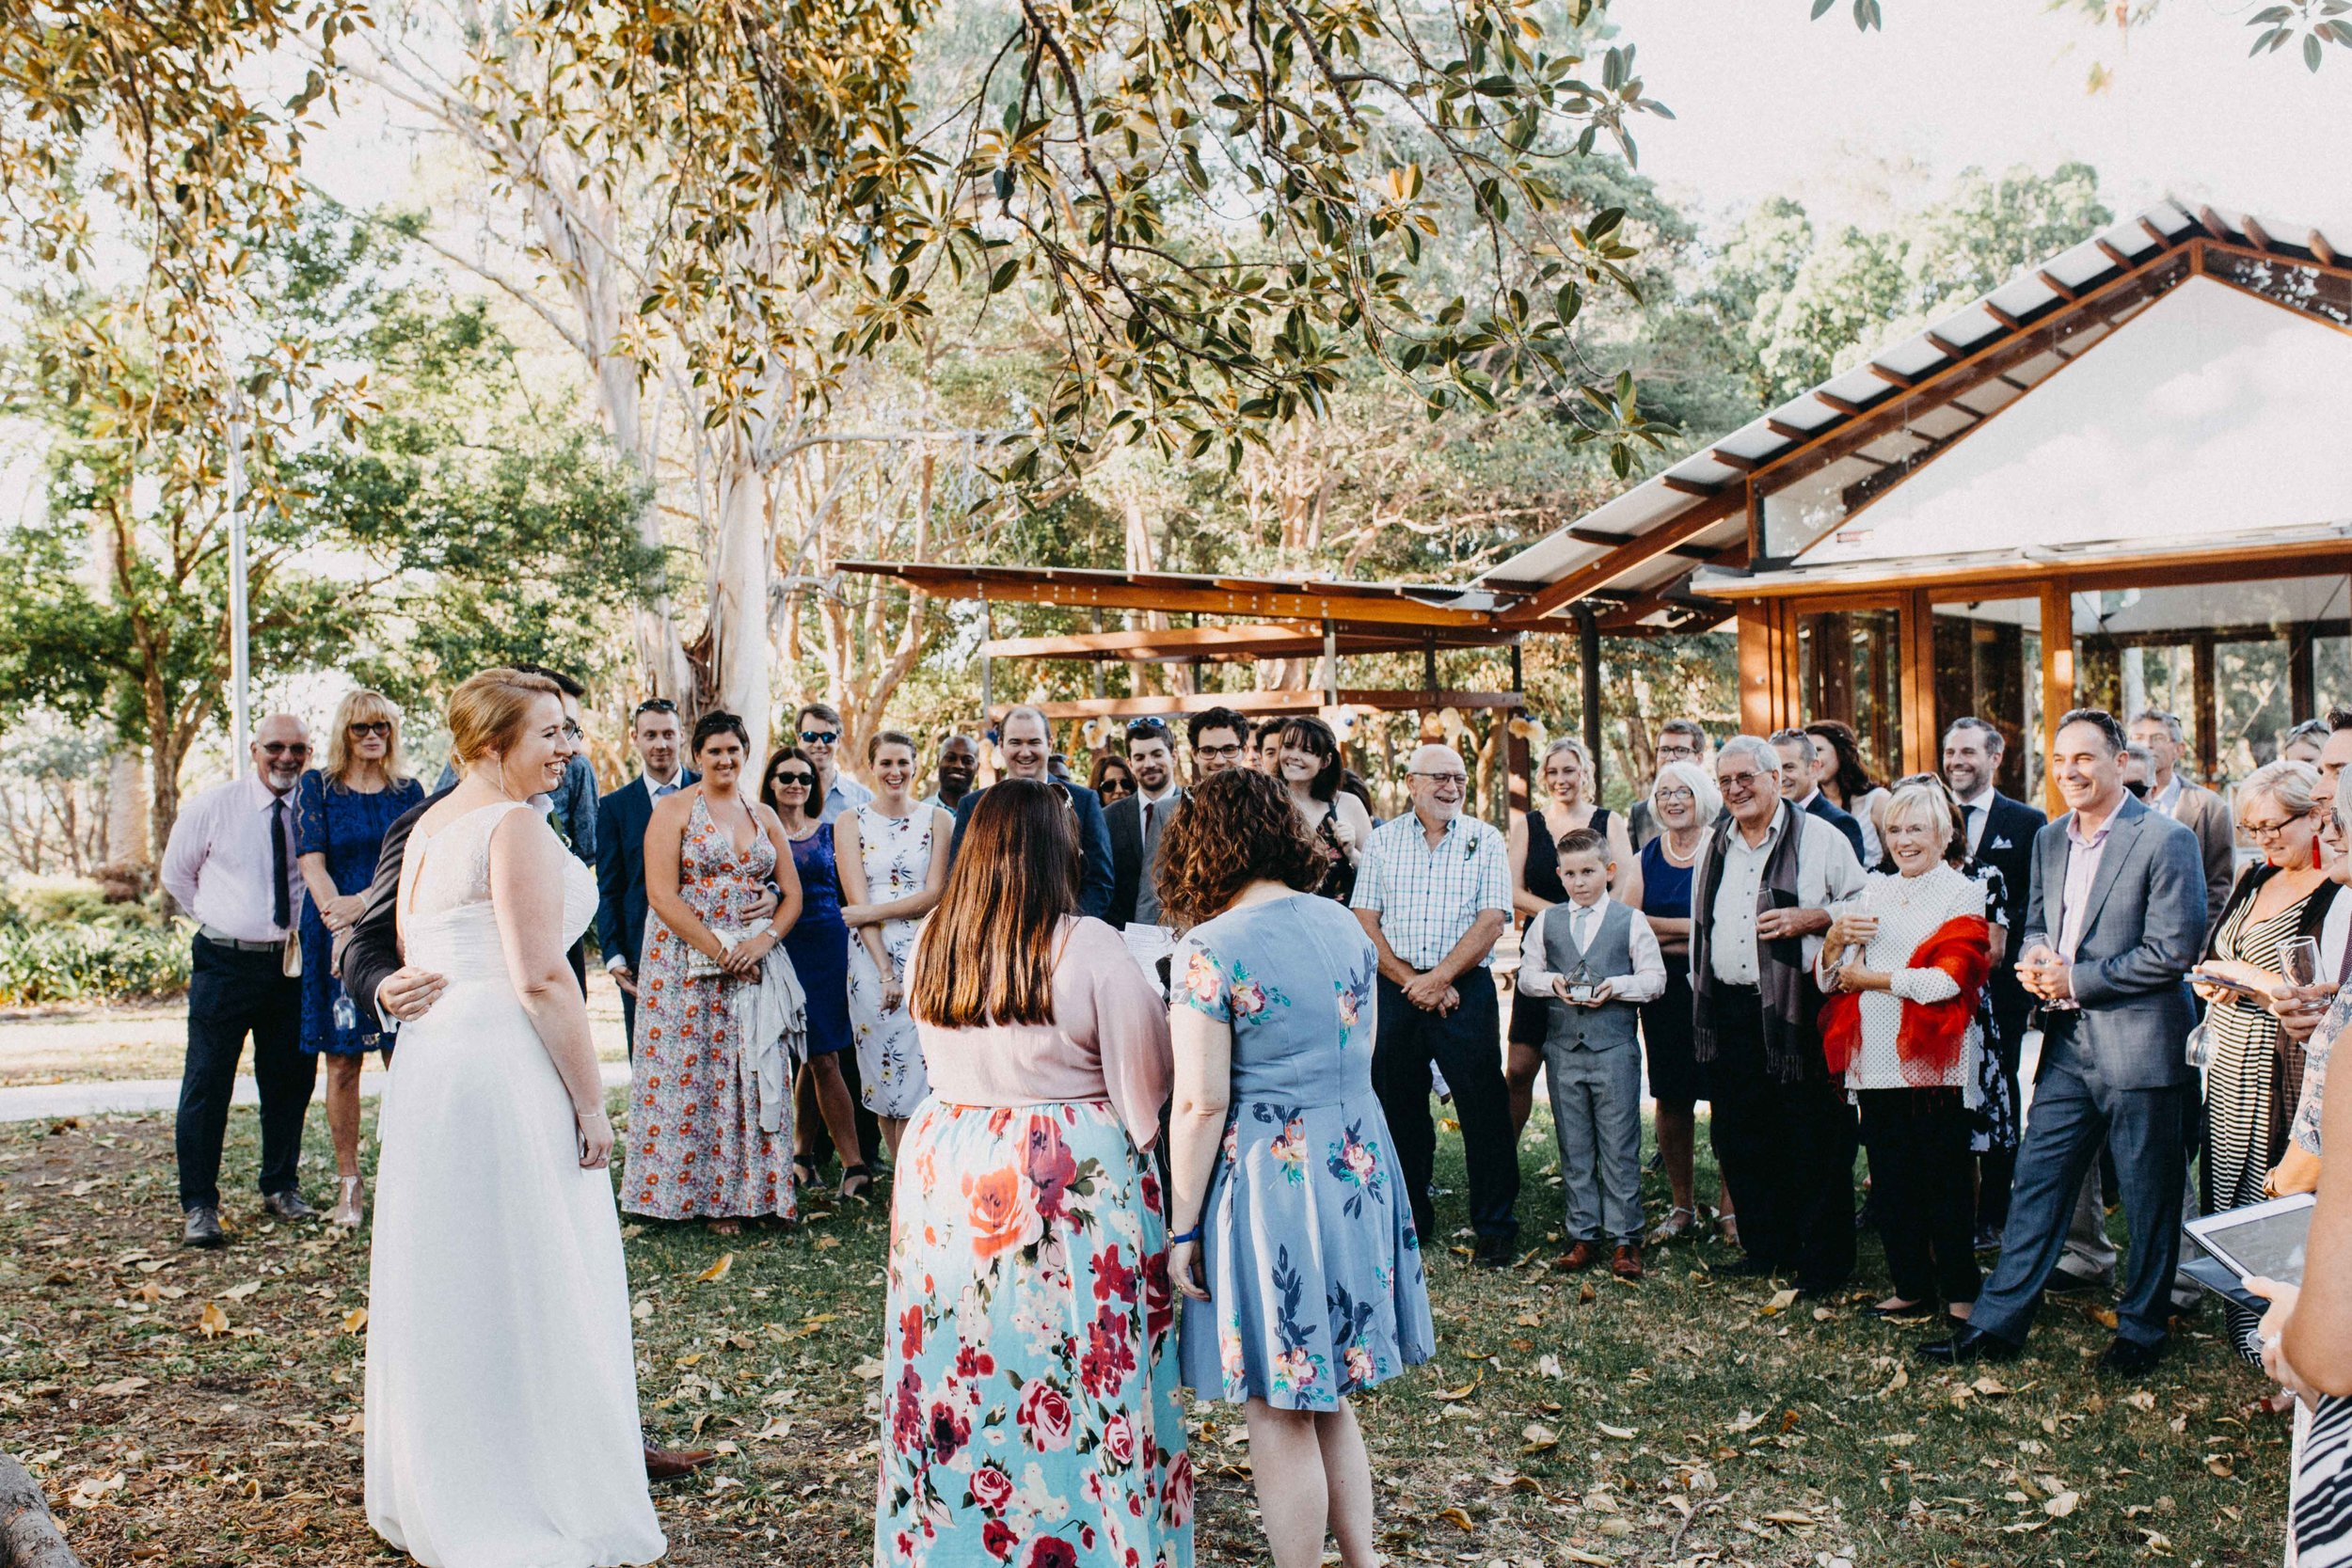 cabarita-park-sydney-wedding-emilyobrienphotography.net-17.jpg